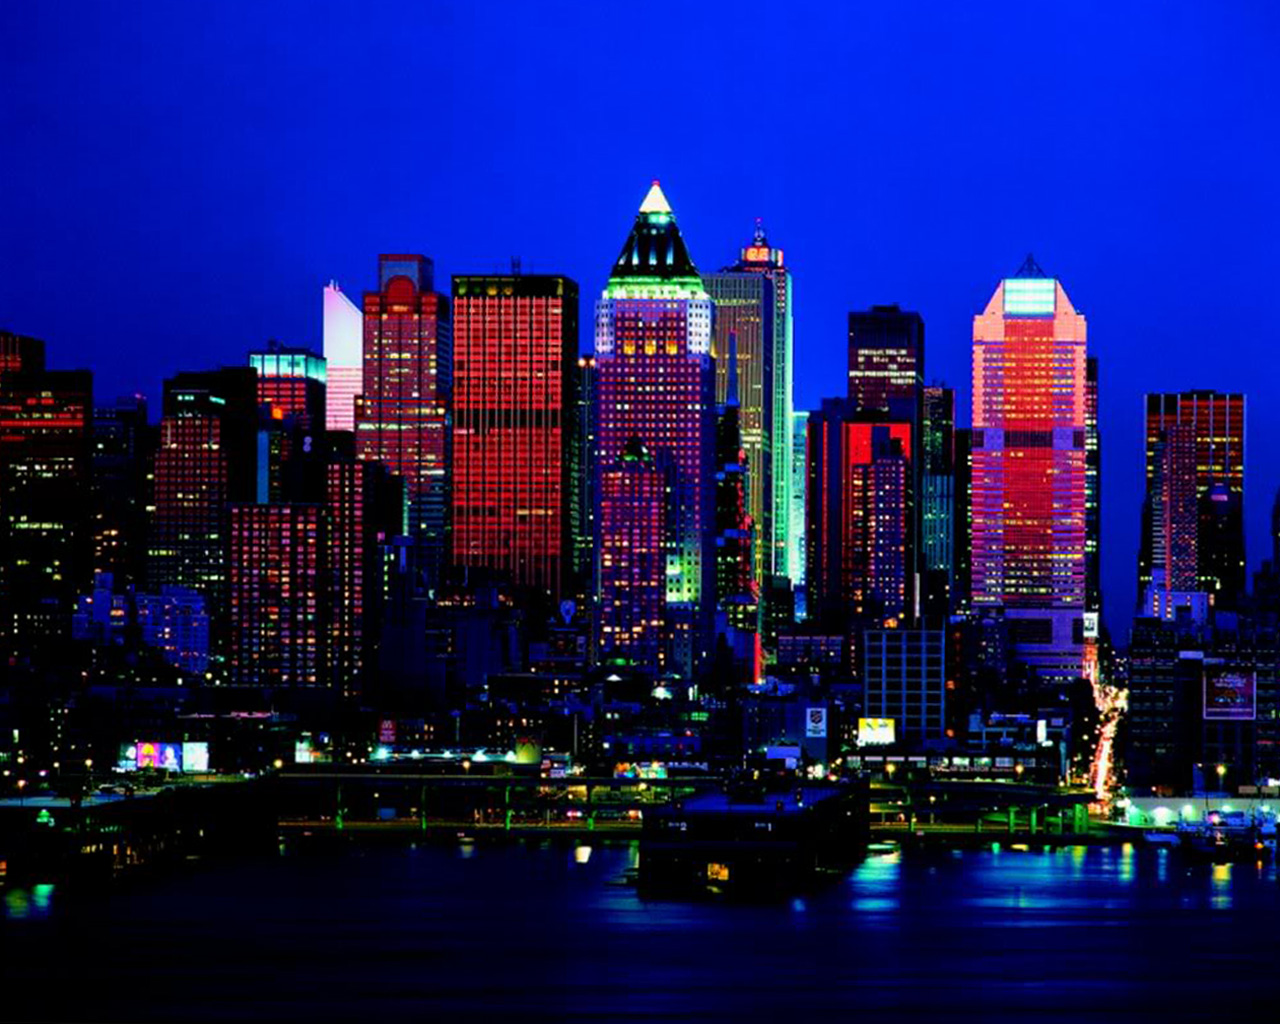 New York City Night Skyline Wallpaper   1280x1024 iWallHD   Wallpaper 1280x1024